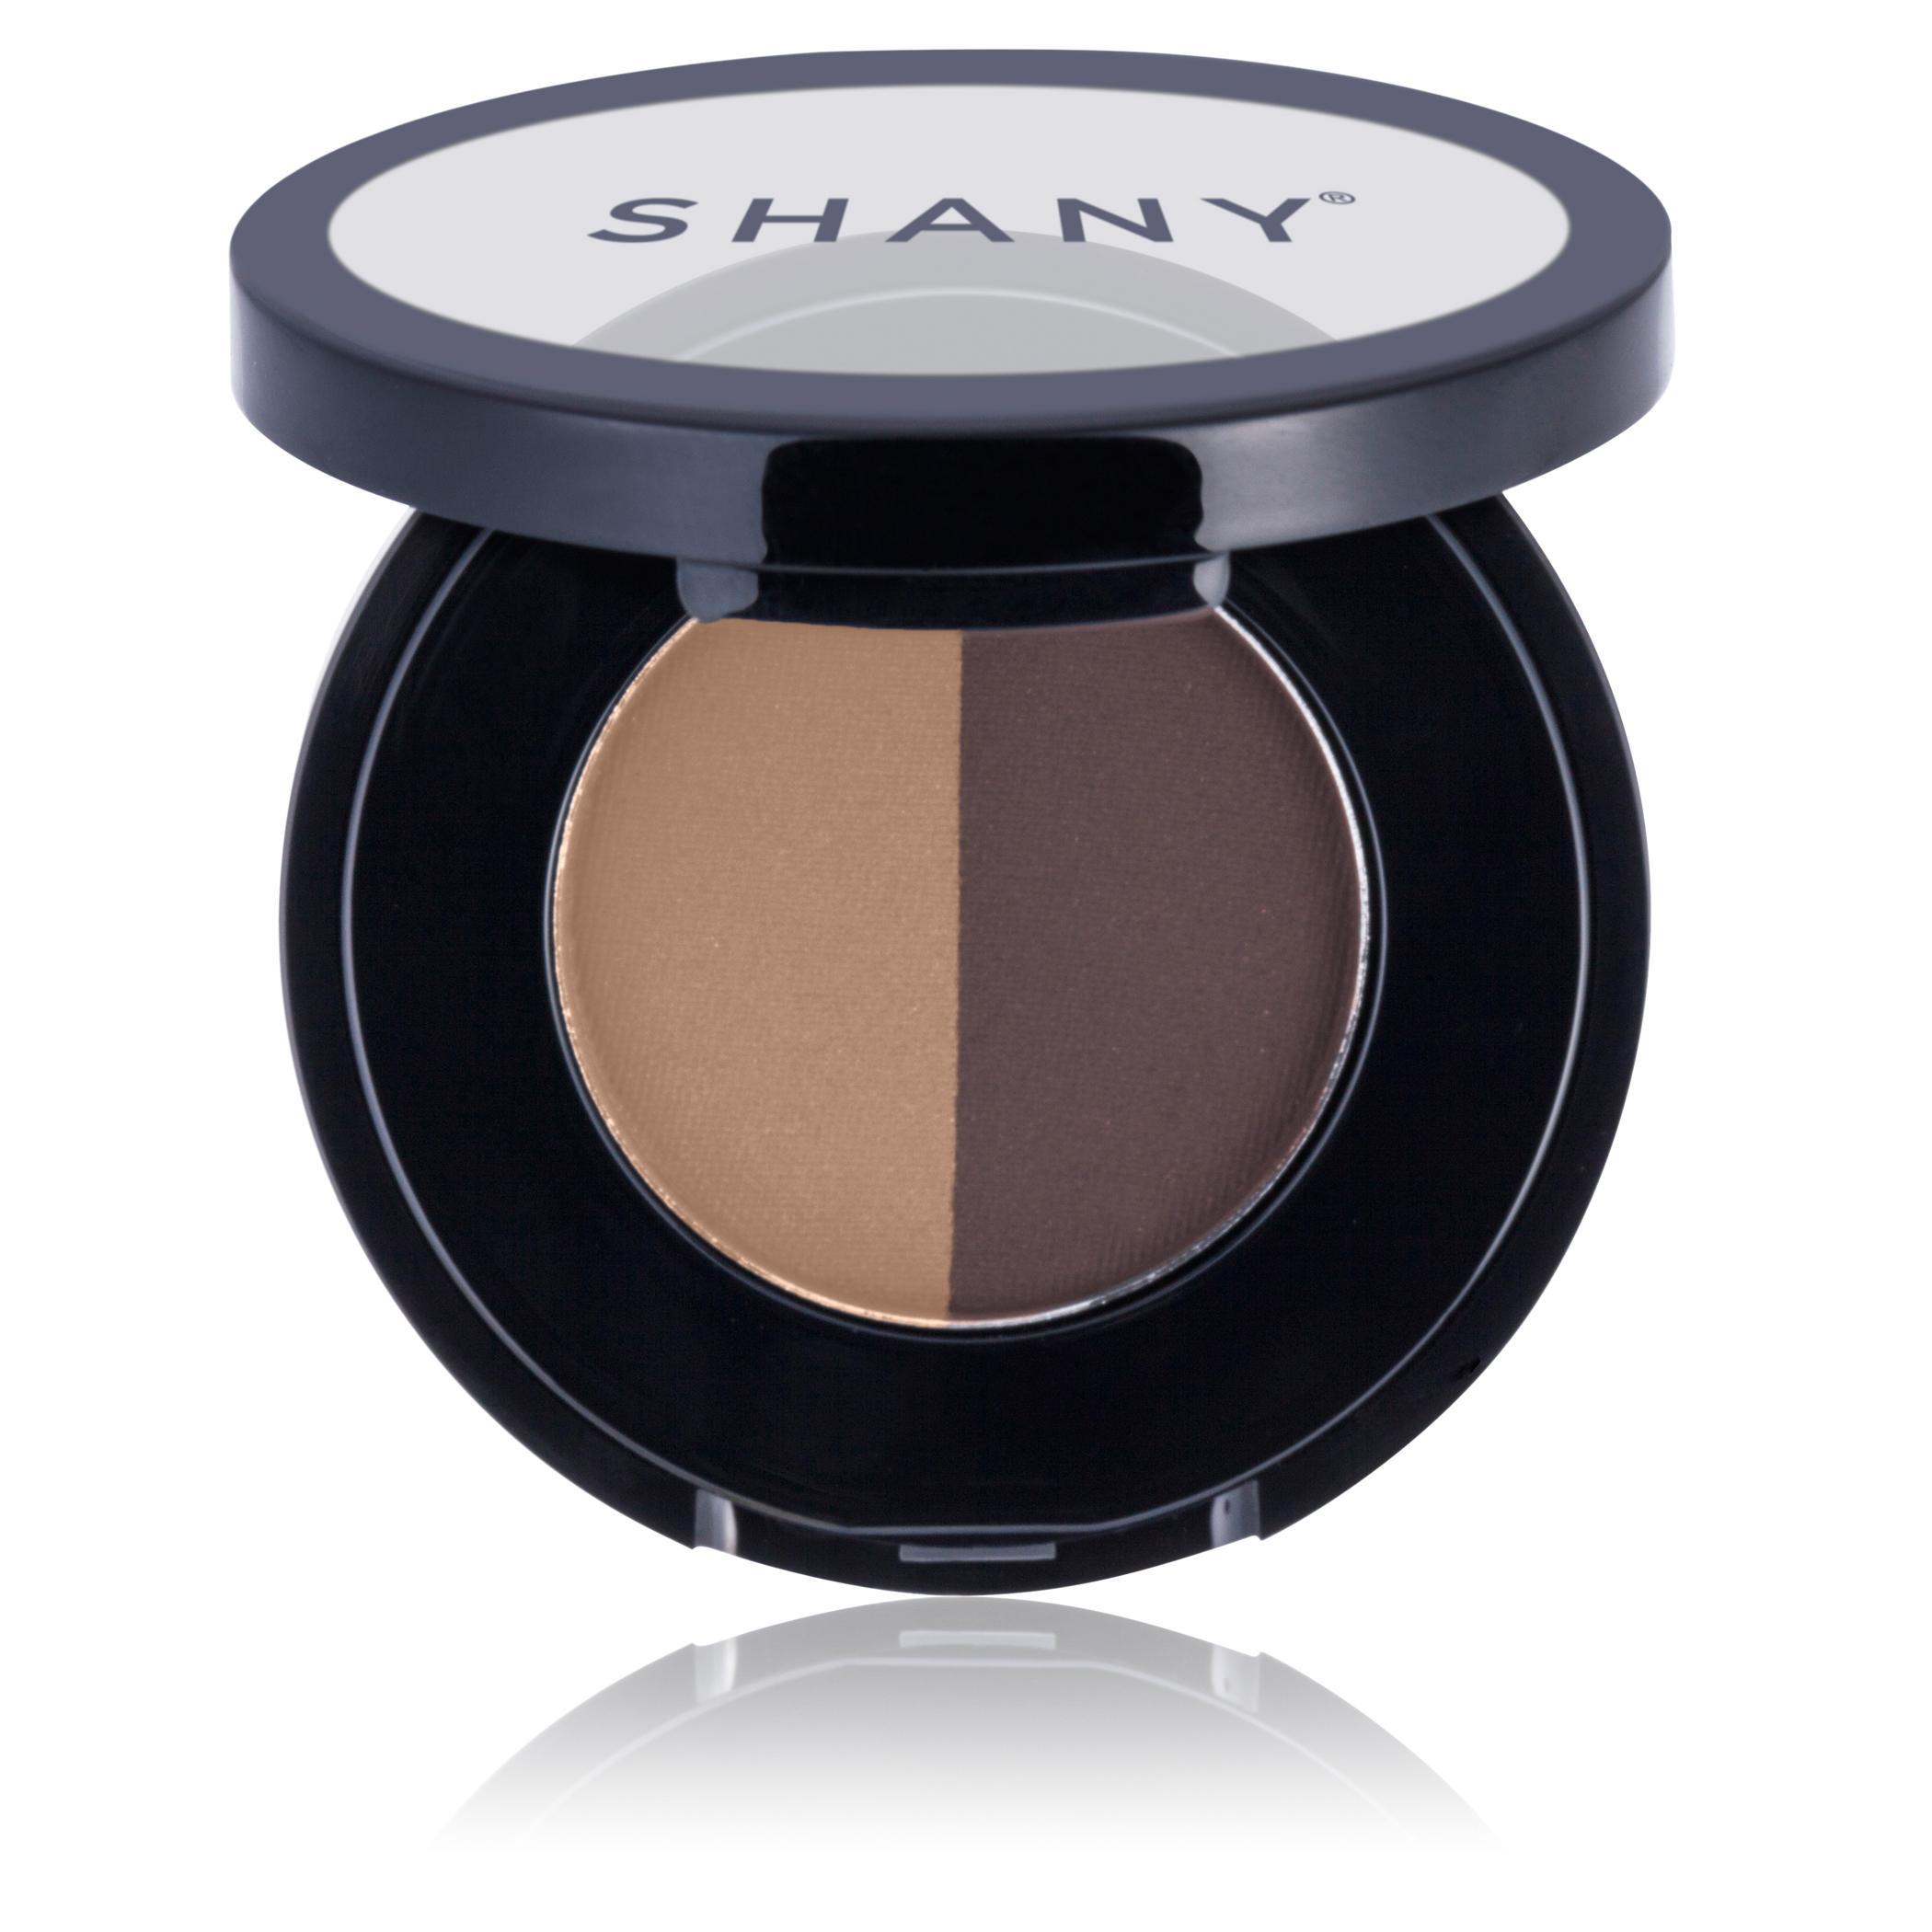 Amazon Shany Brow Duo Makeup Kit Paraben Free Brunette 1